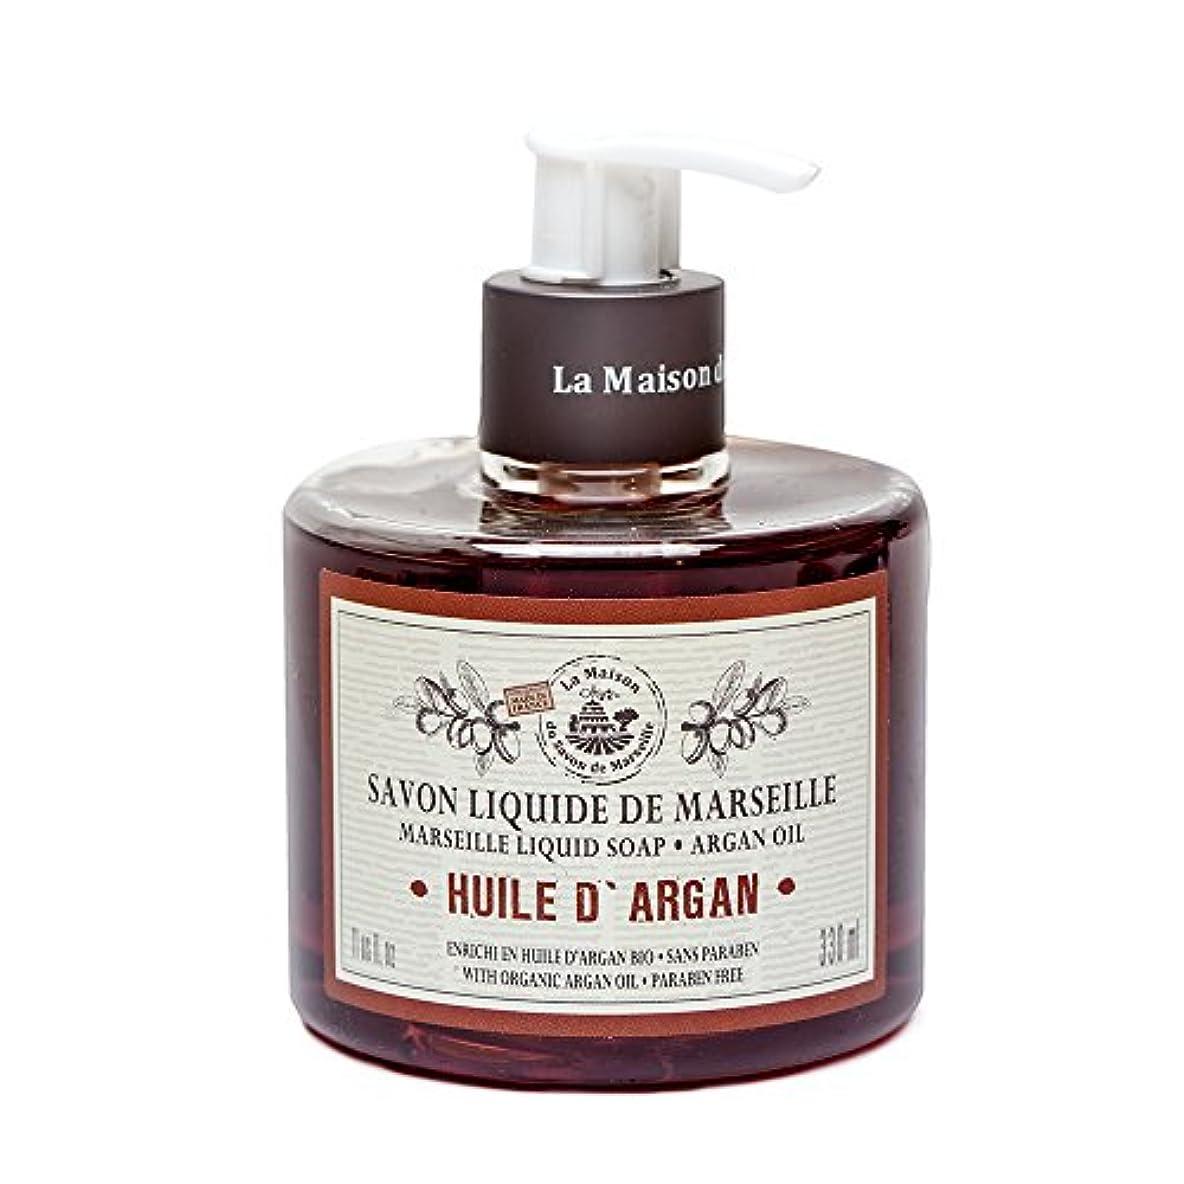 Savon de Marseille Liquid Soap,Organic Argan oil 330ml